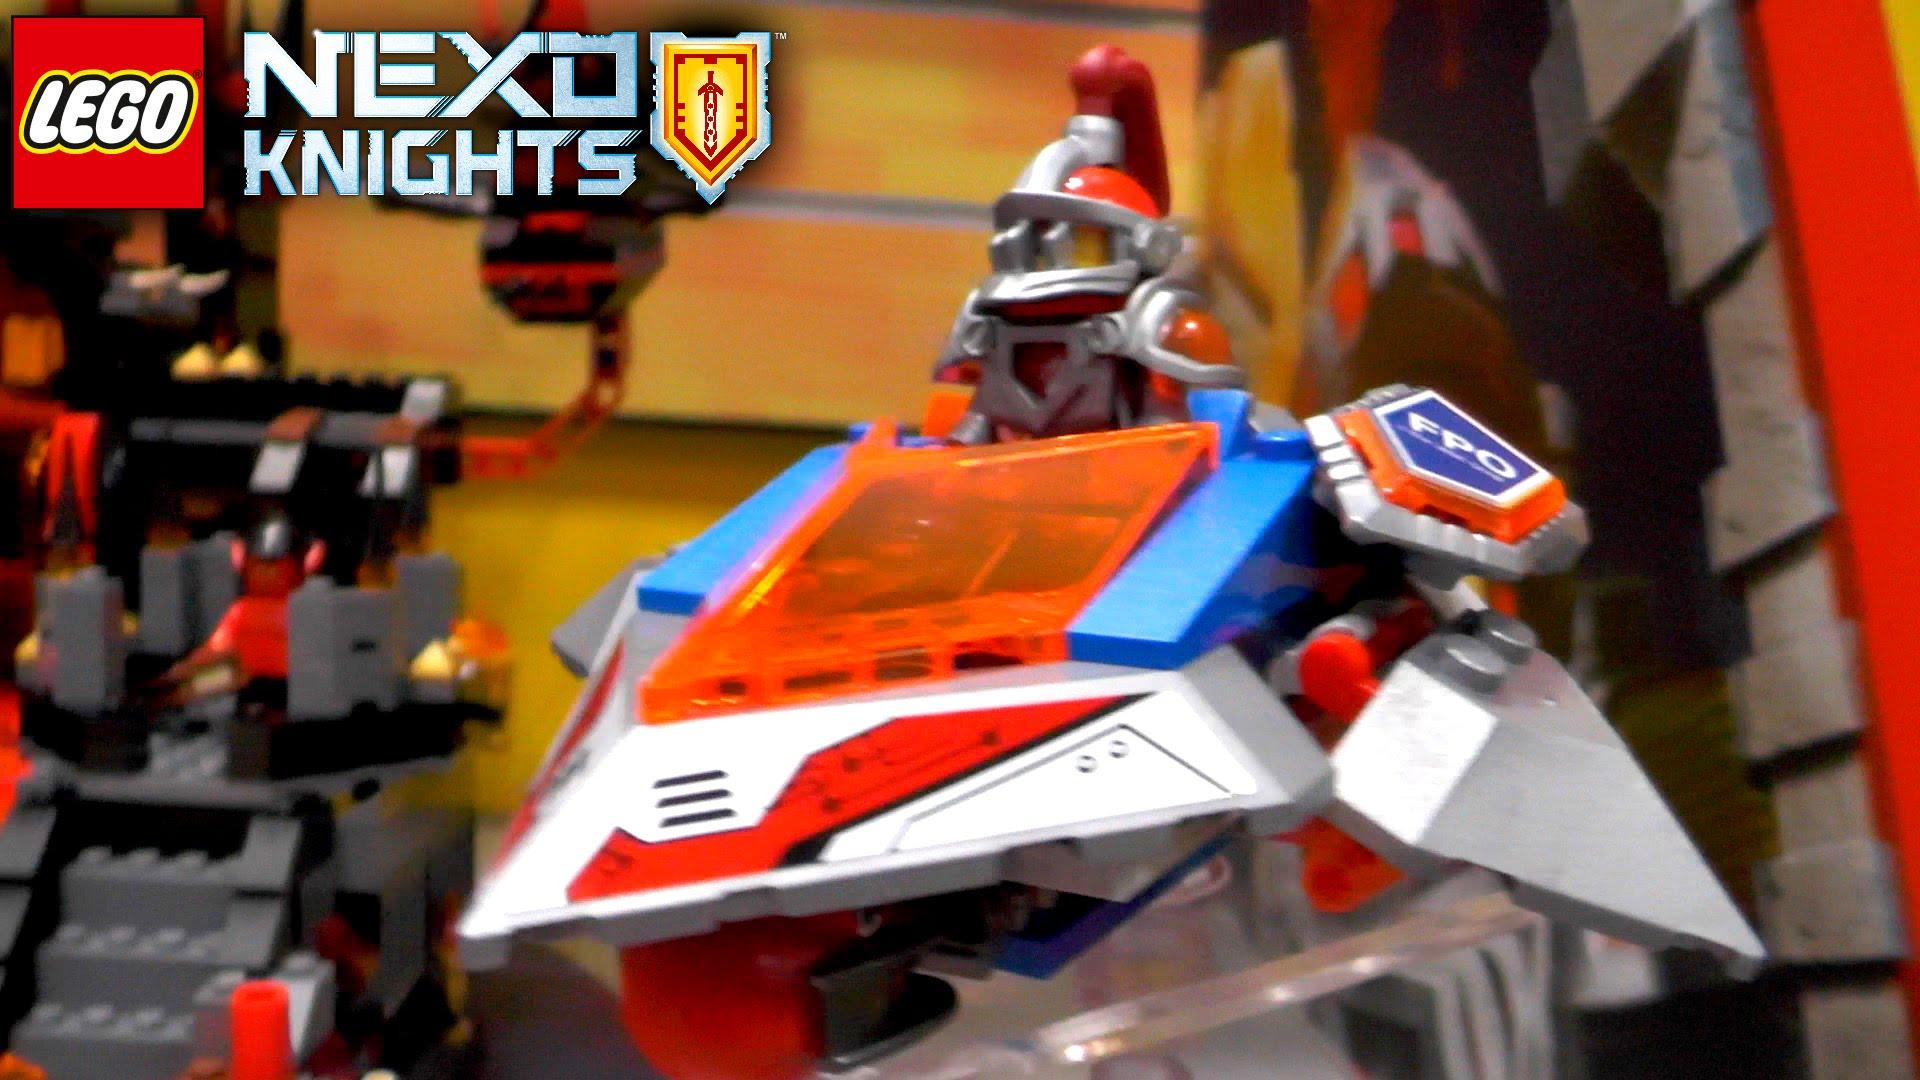 LEGO Nexo Knights 2016 Summer & Fall (Ultimate Axl, Lance, Magmar, Flama)